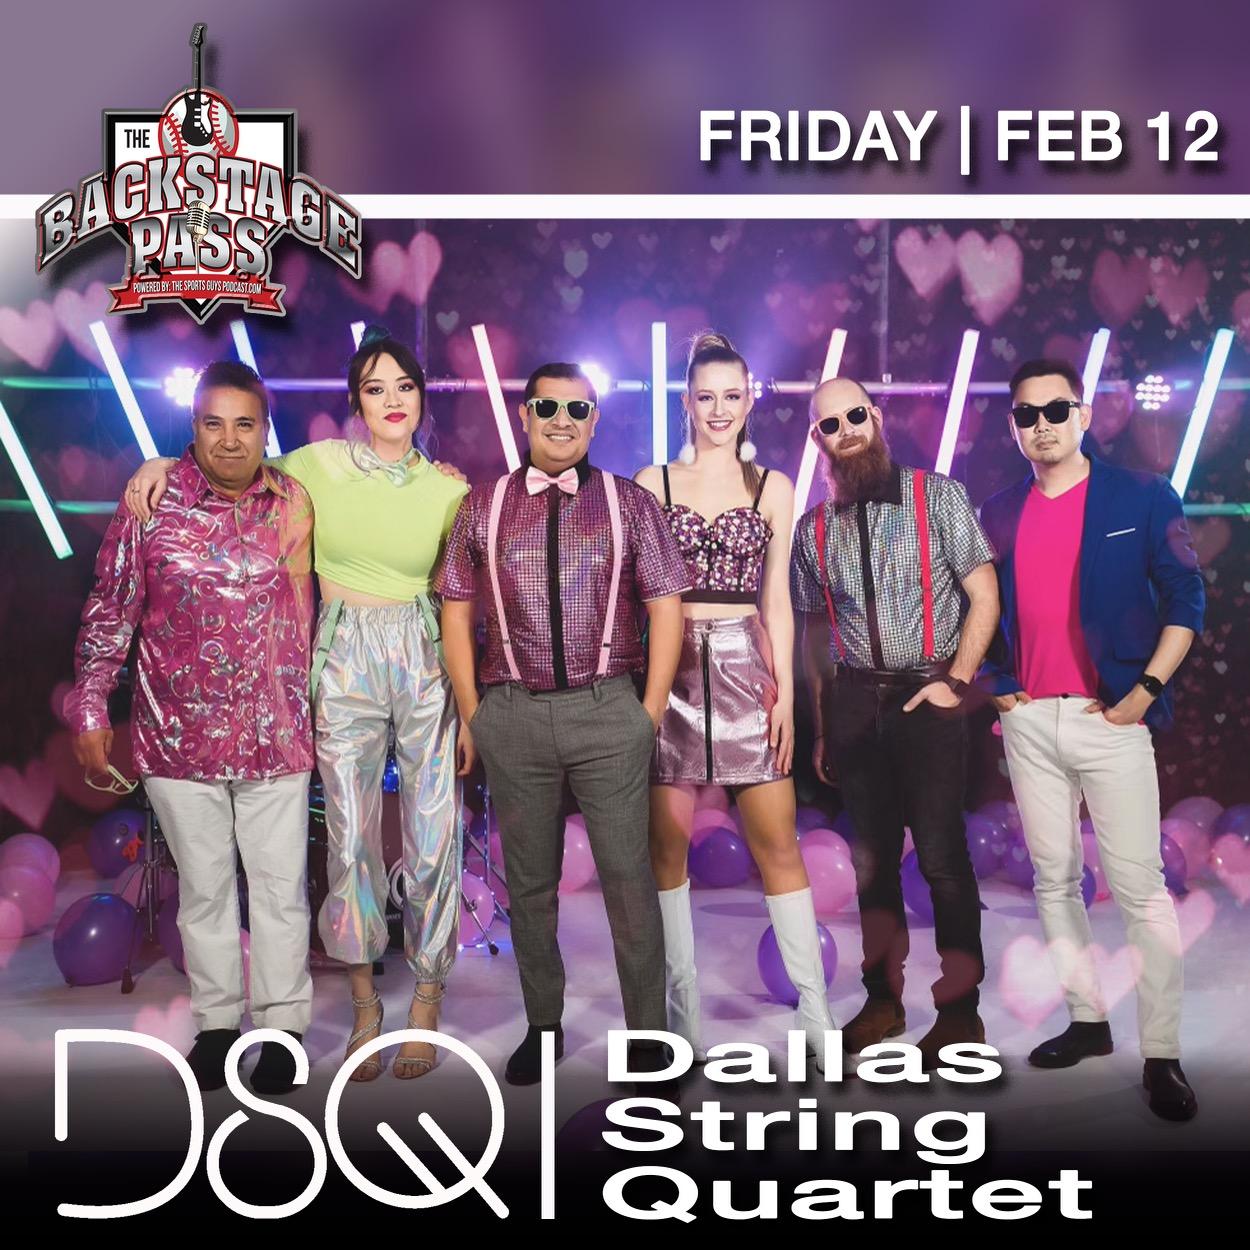 backstage_pass_dallas_string_quartet